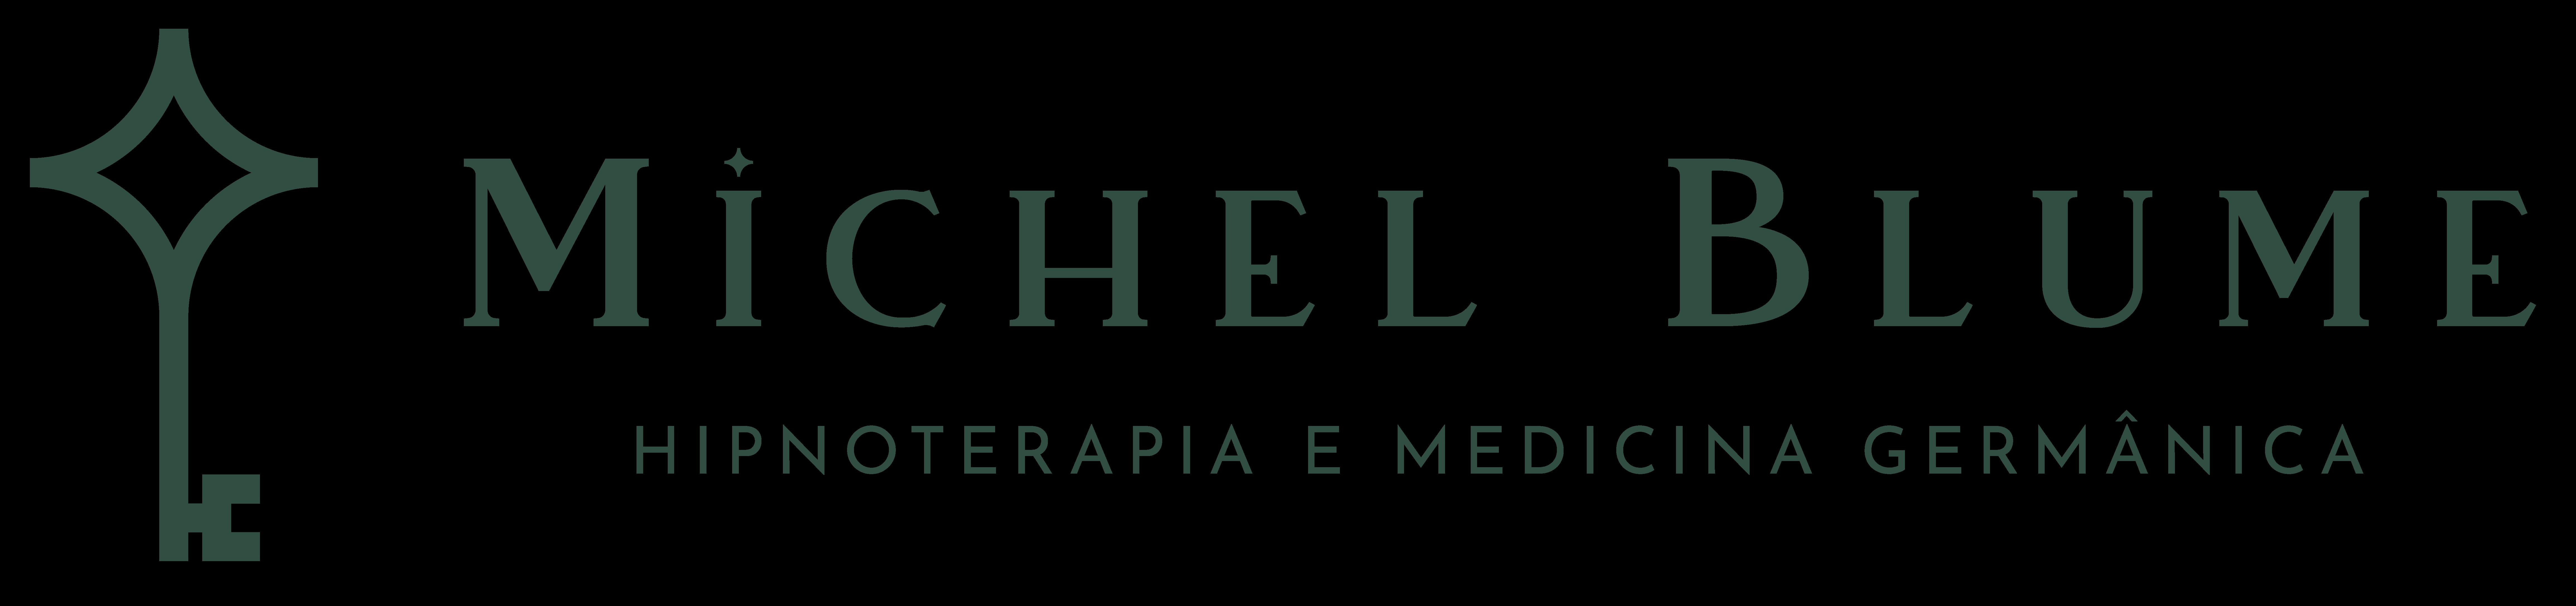 Hipnoterapia Maringá – Hipnoterapeuta Maringá – Michel Blume Hipnoterapia